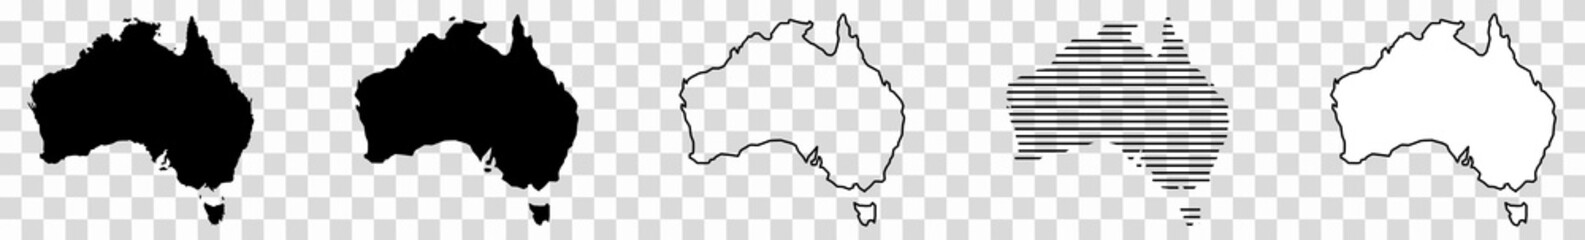 Fototapeta Australia Map Black | Australian Border | Continent | Transparent Isolated | Variations obraz